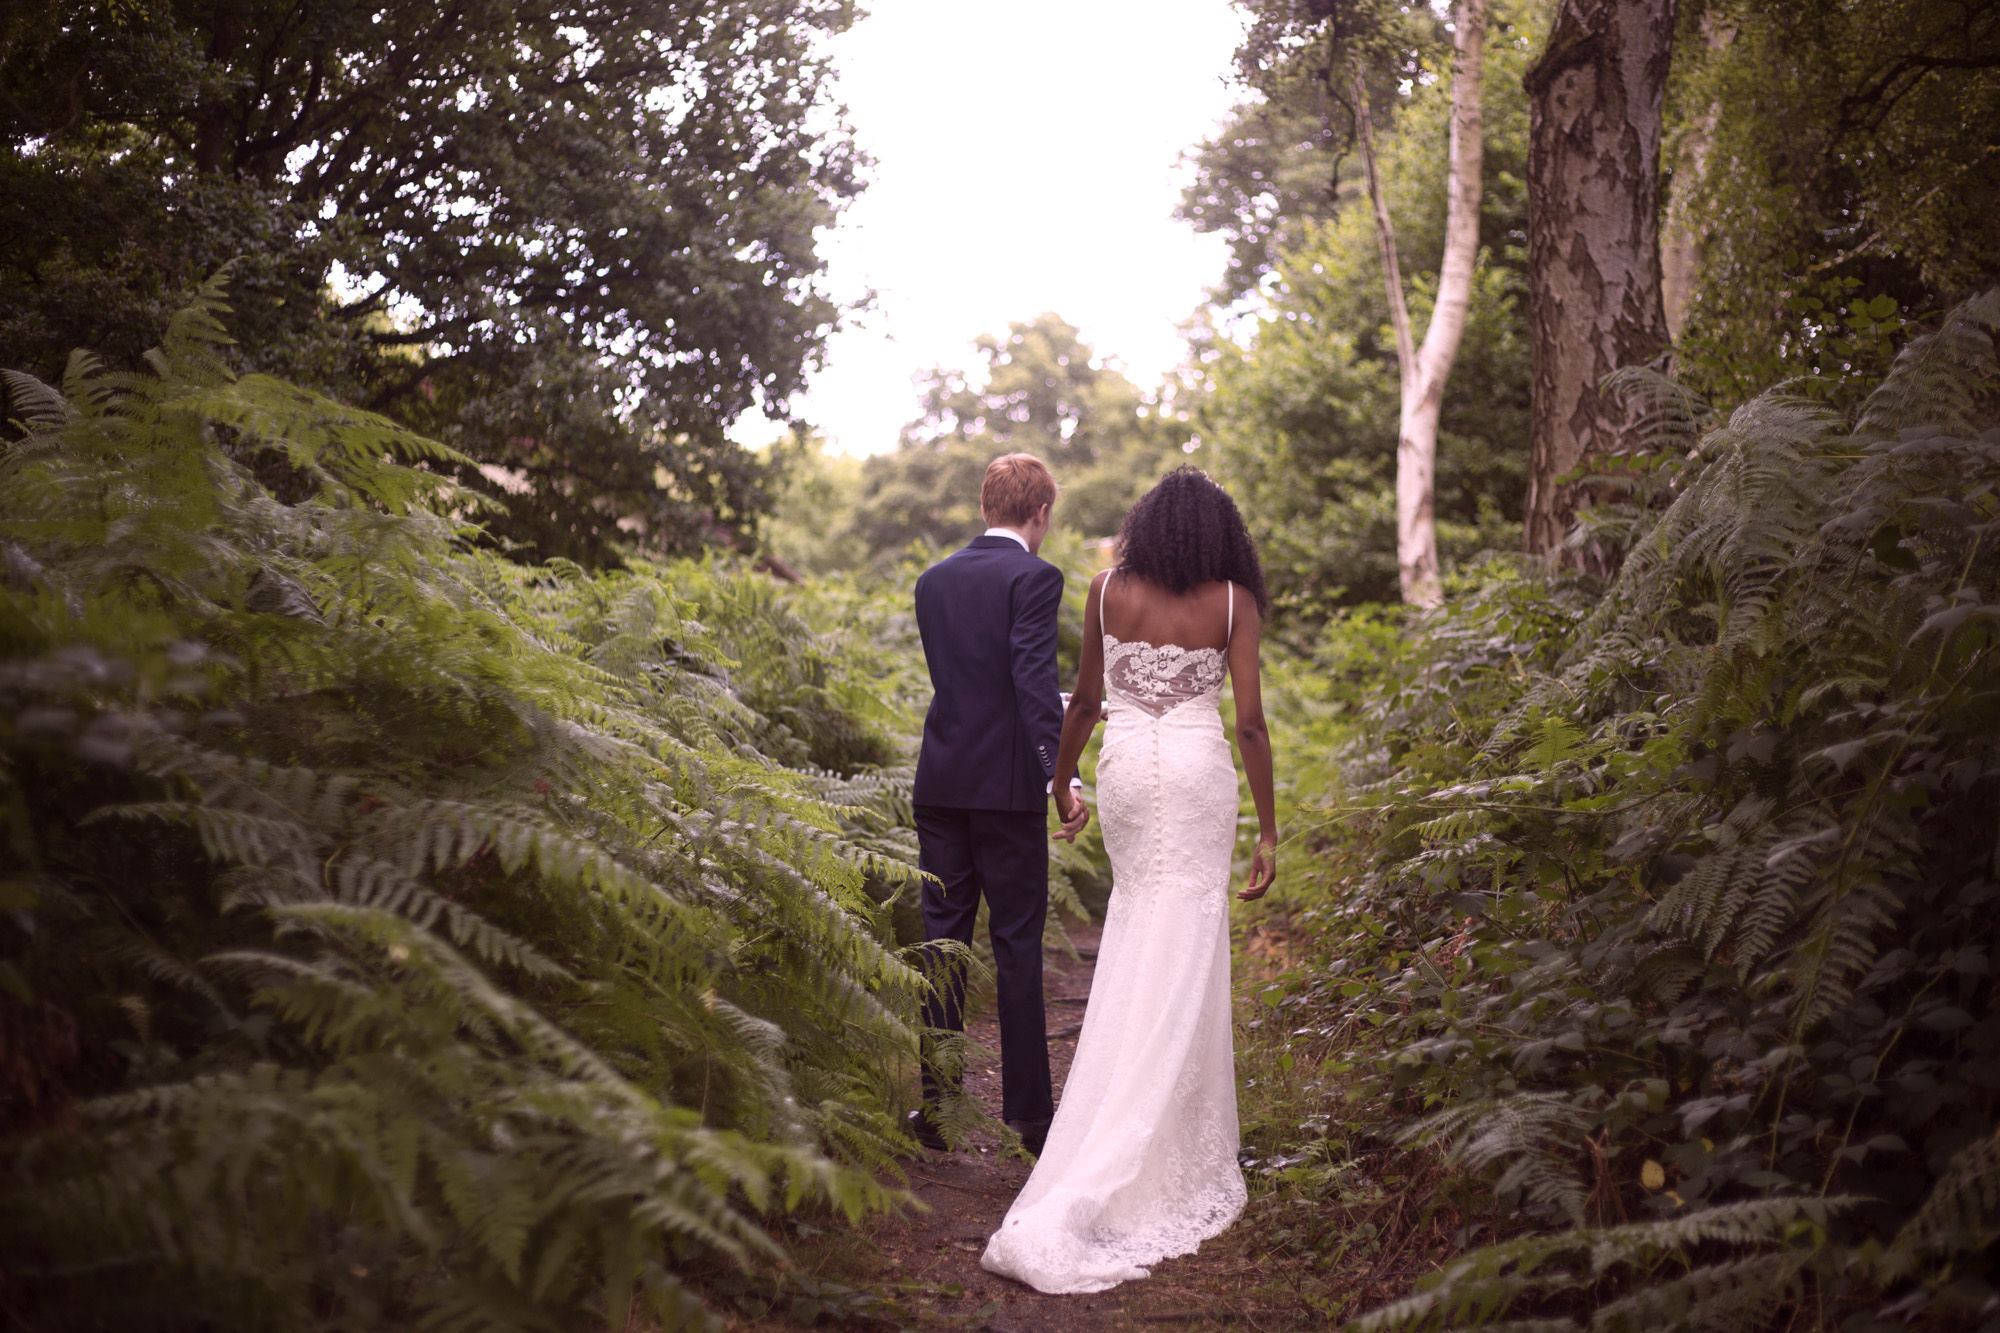 Bride and groom walk through the ferns Cuffley camp Essence of Australia wedding dress outdoor woodland wedding photographer